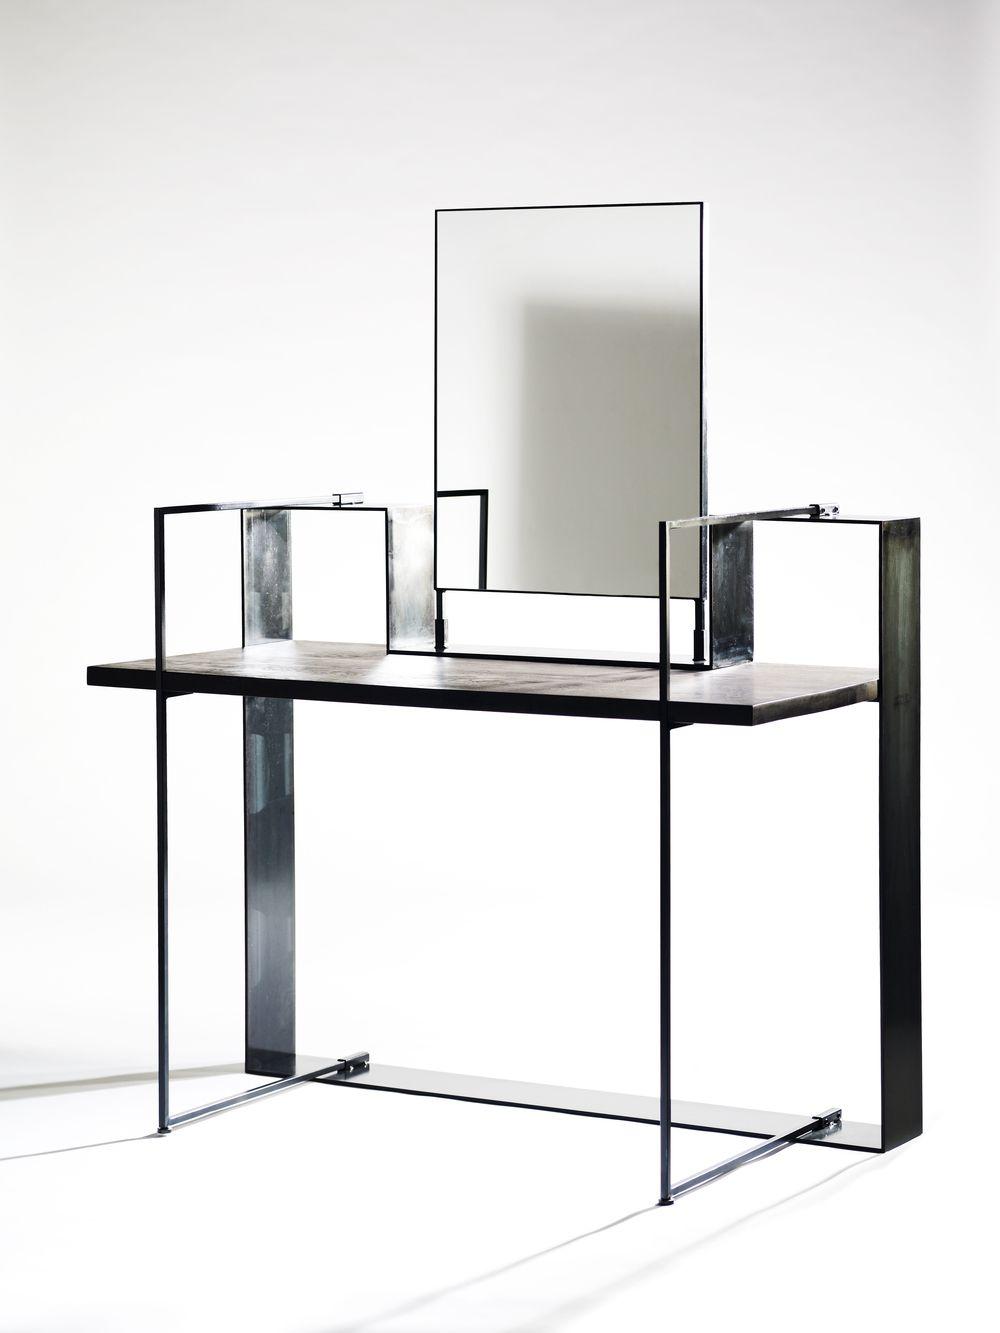 Vanity no by martine brisson squre shaped pinterest vanities